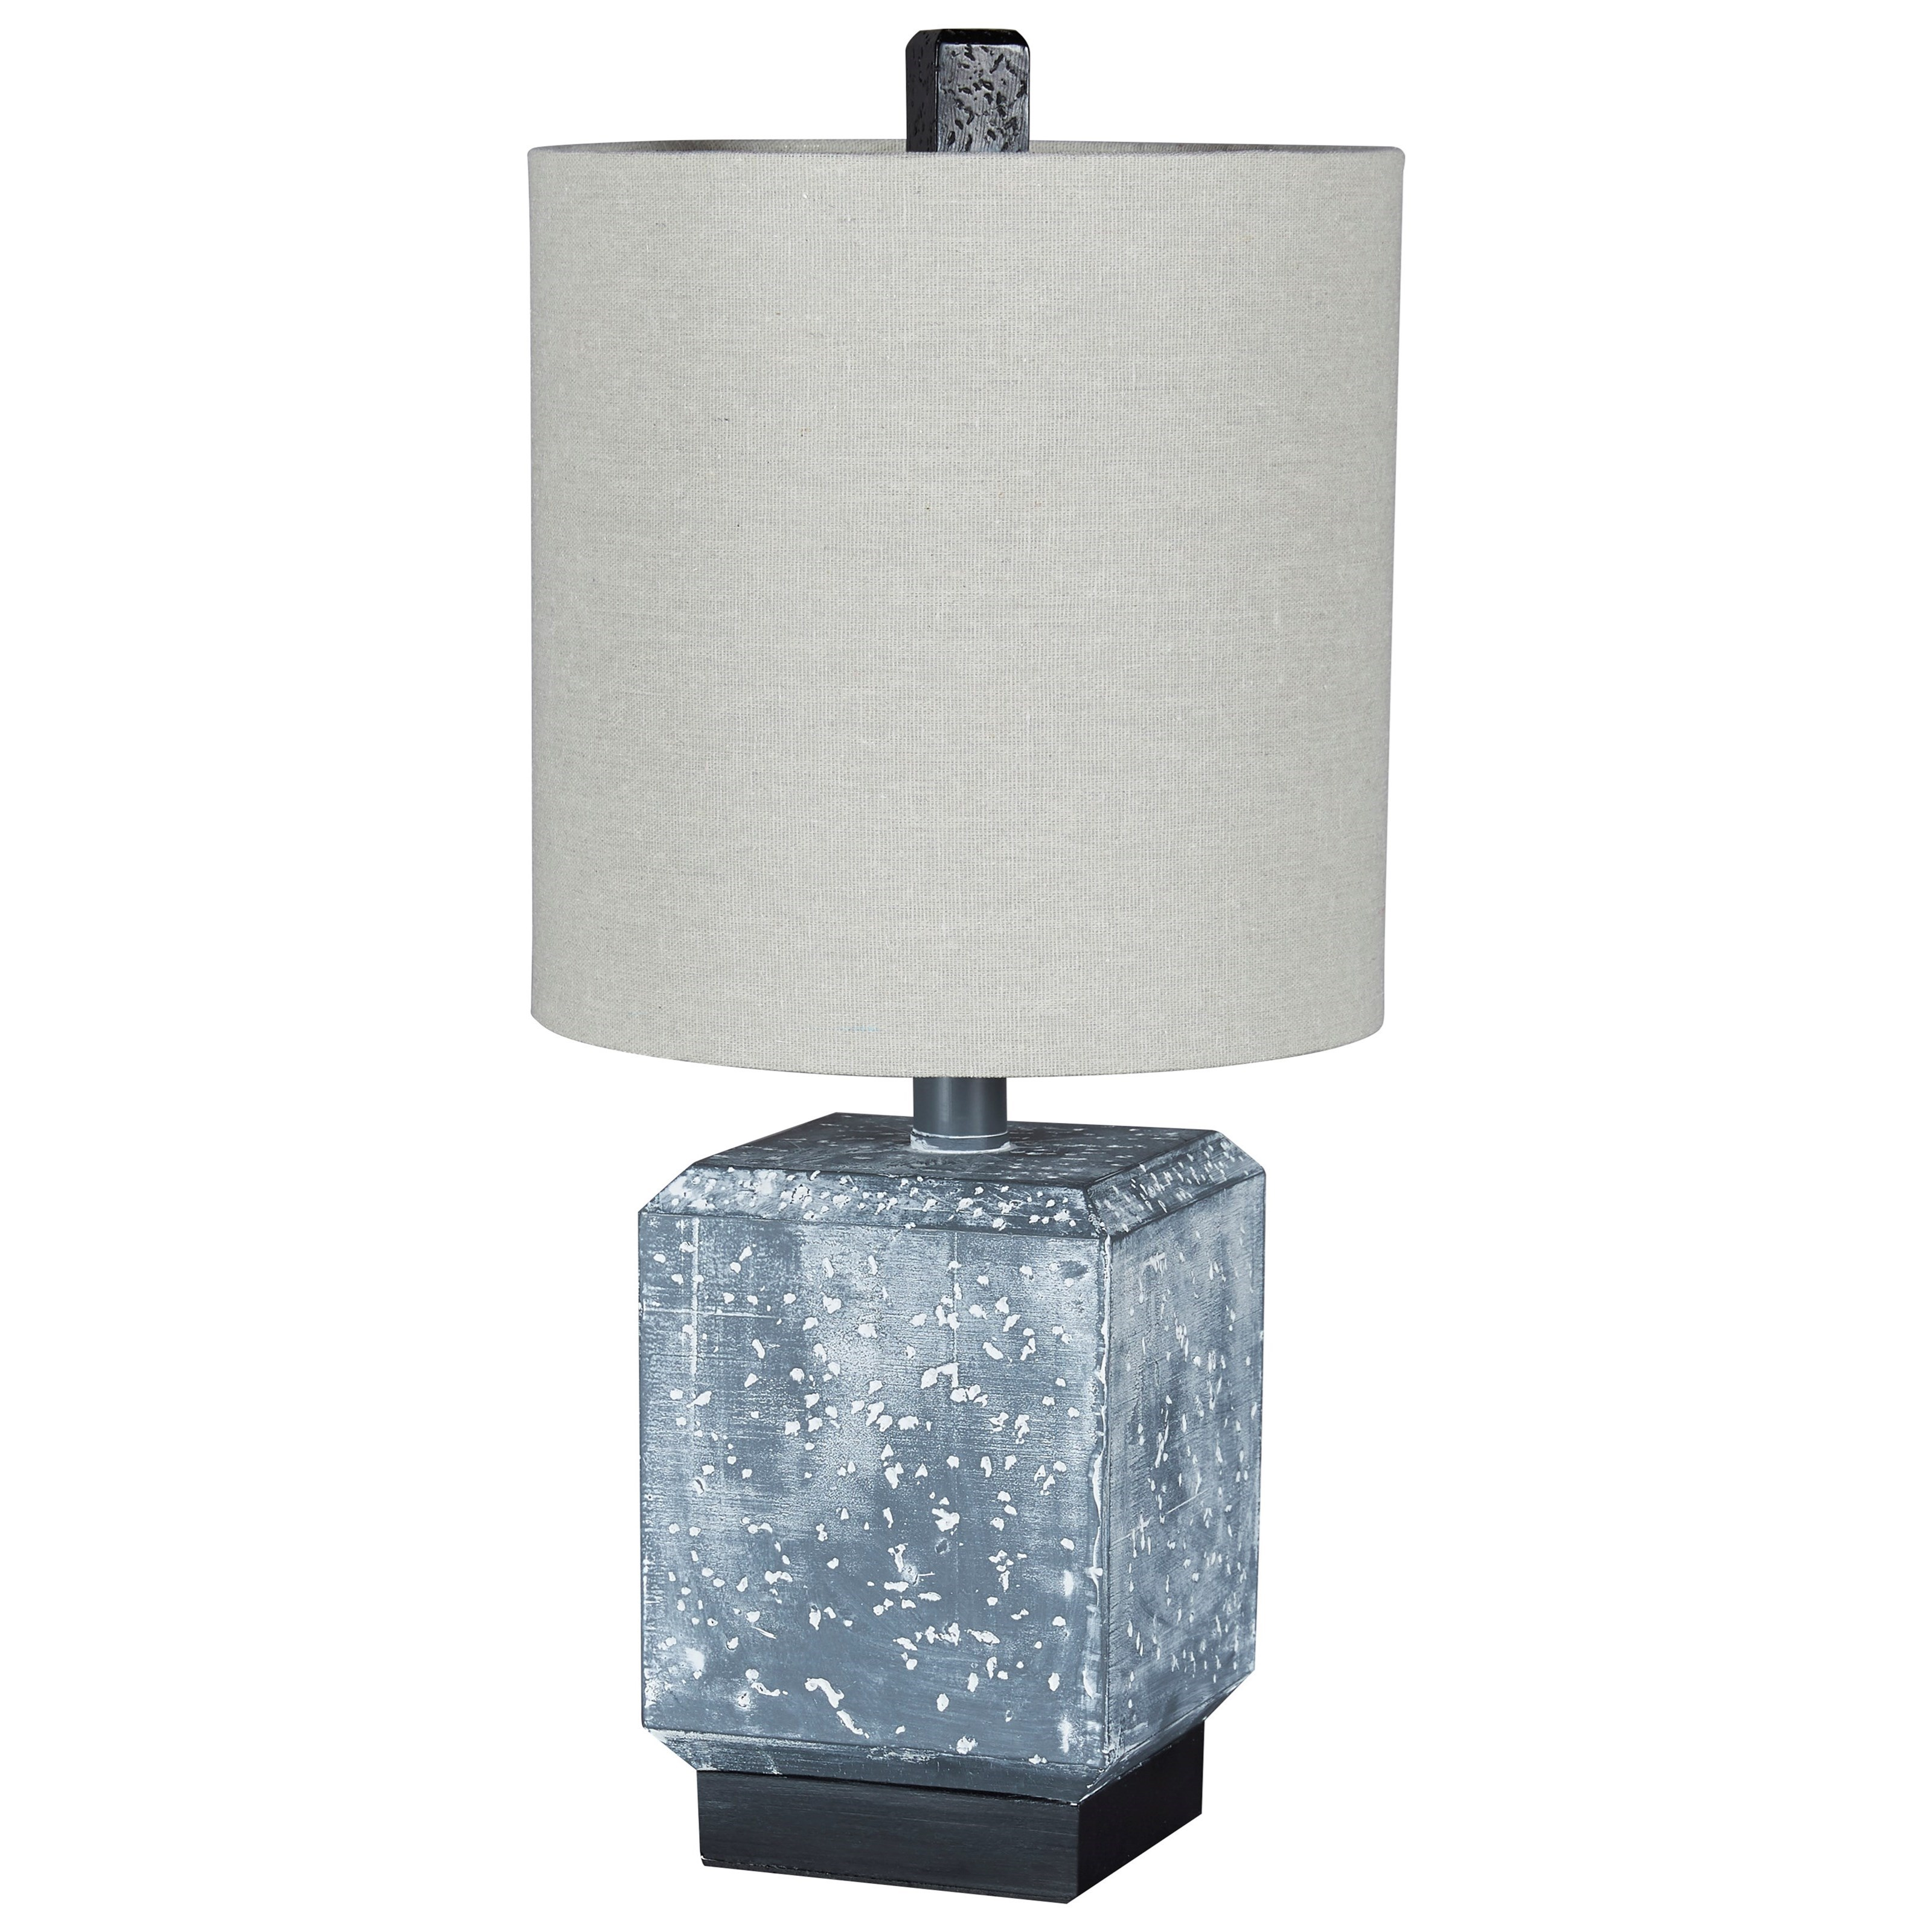 Lamps - Contemporary Jamila Gray/Black Poly Table Lamp by Ashley (Signature Design) at Johnny Janosik